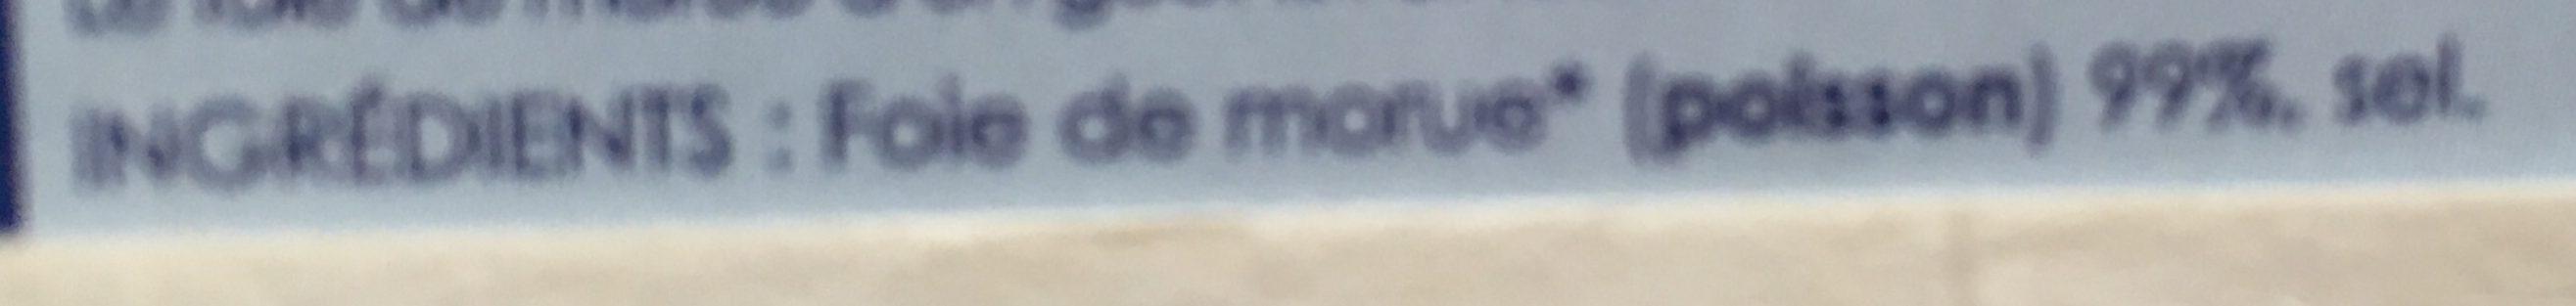 Foie de morue -25% de sel - Ingredients - fr